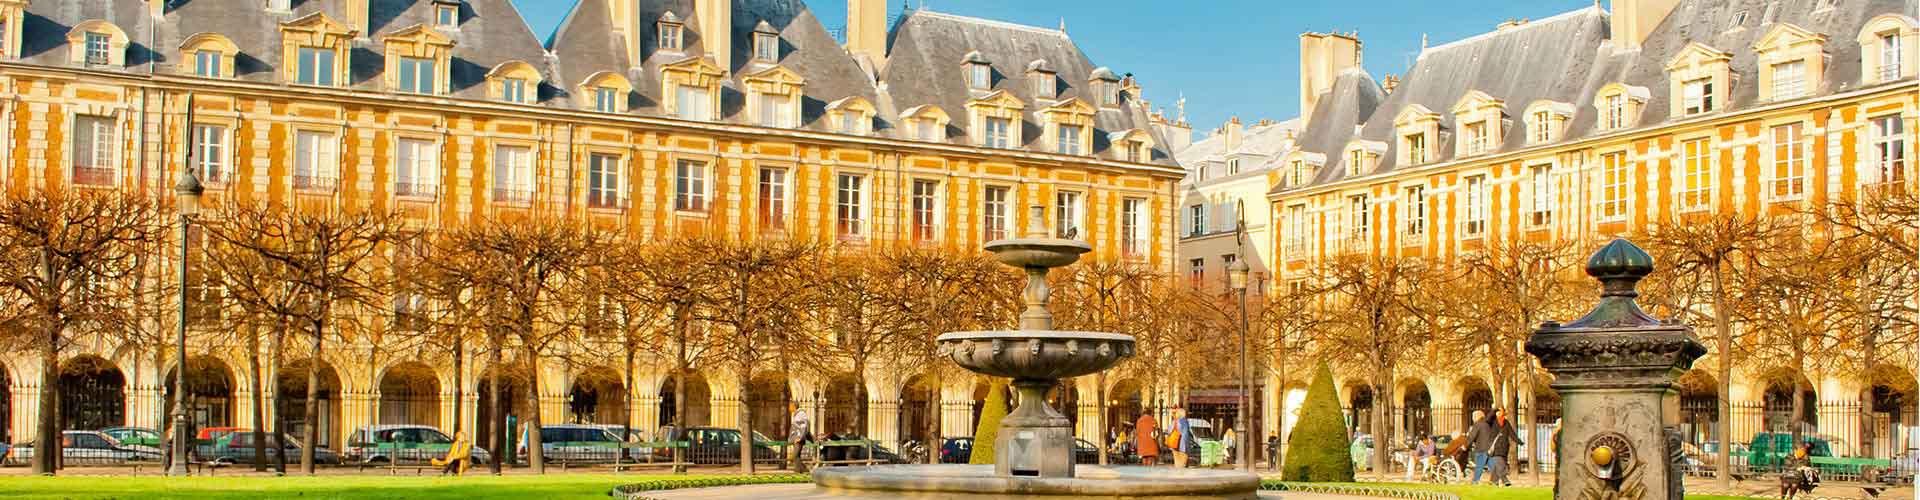 París - Hoteles baratos cerca a Place Vendôme. Mapas de París, Fotos y comentarios de cada Hotel en París.